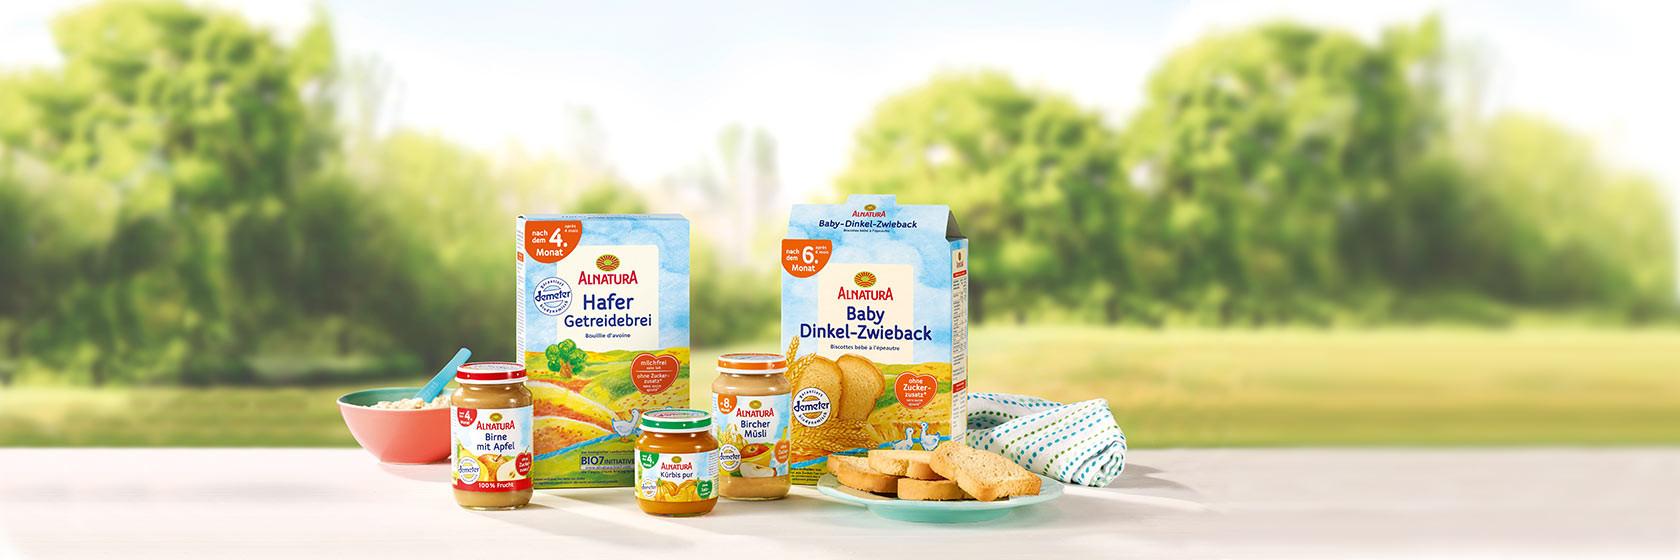 Best Fiends Ostereier 2018 Einzigartig Alnatura Bio Lebensmittel Aus Dem Super Natur Markt Fotografieren